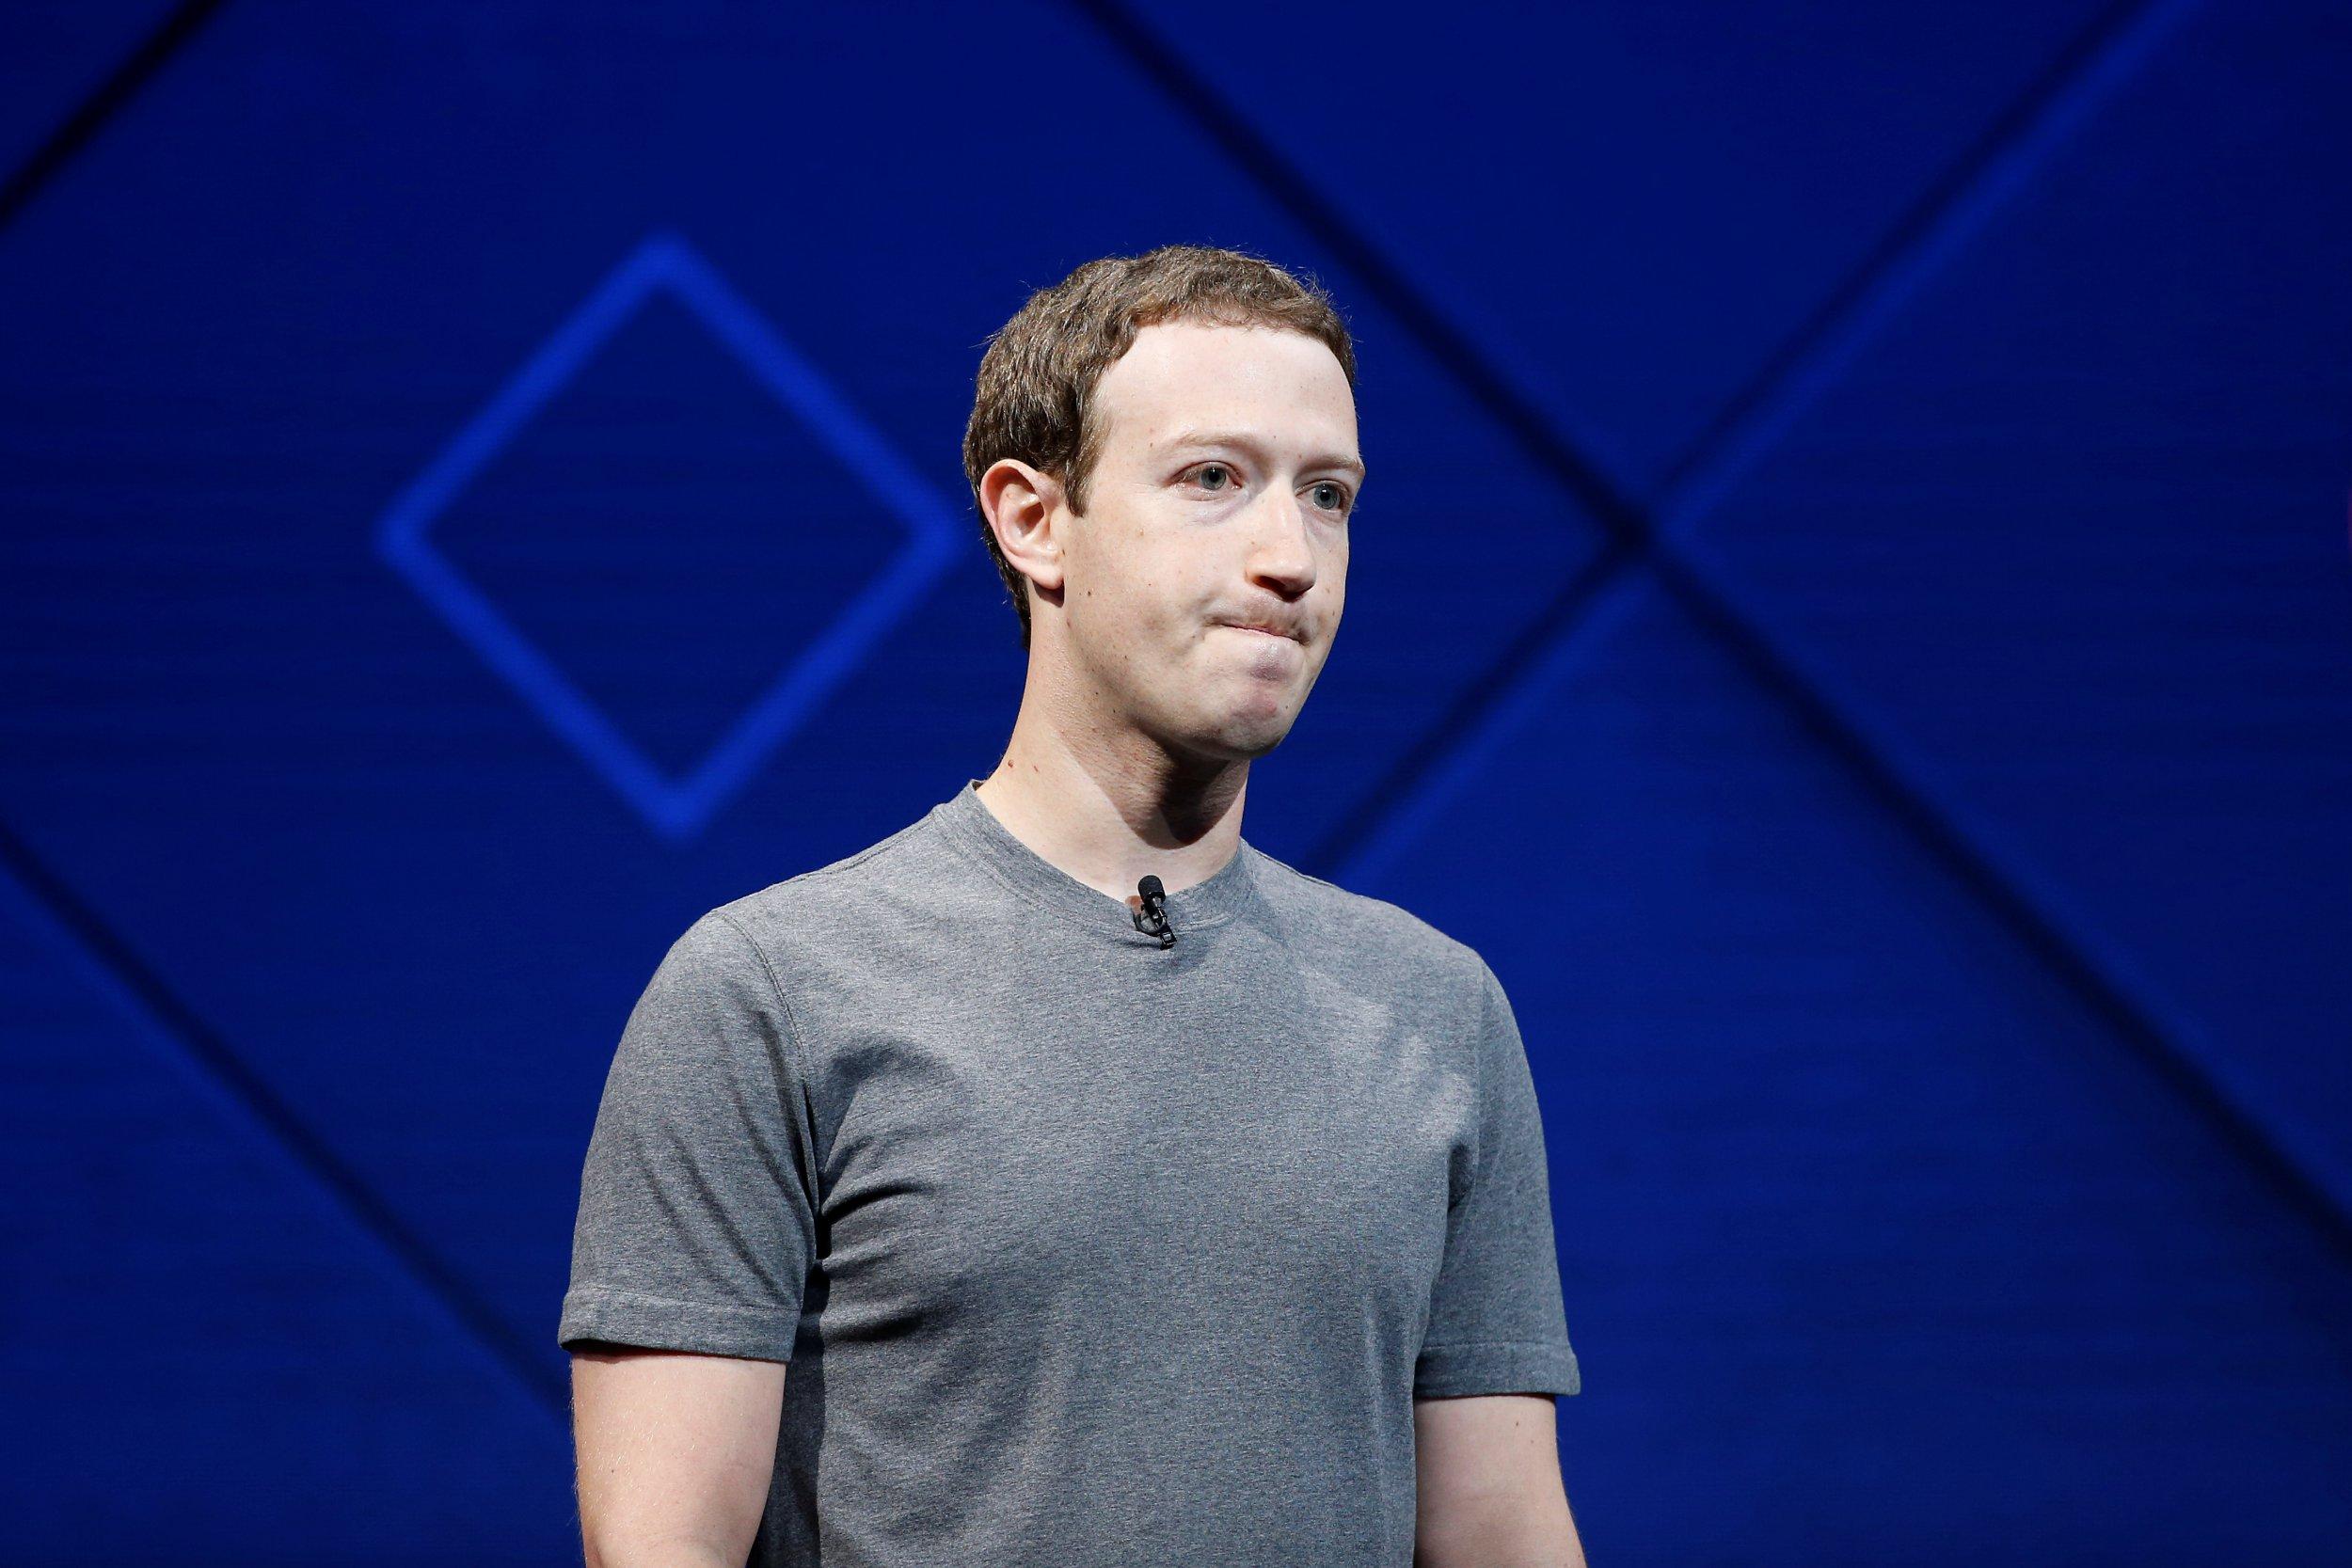 Mark Zuckerberg to testify before US Congress about Cambridge Analytica data leak